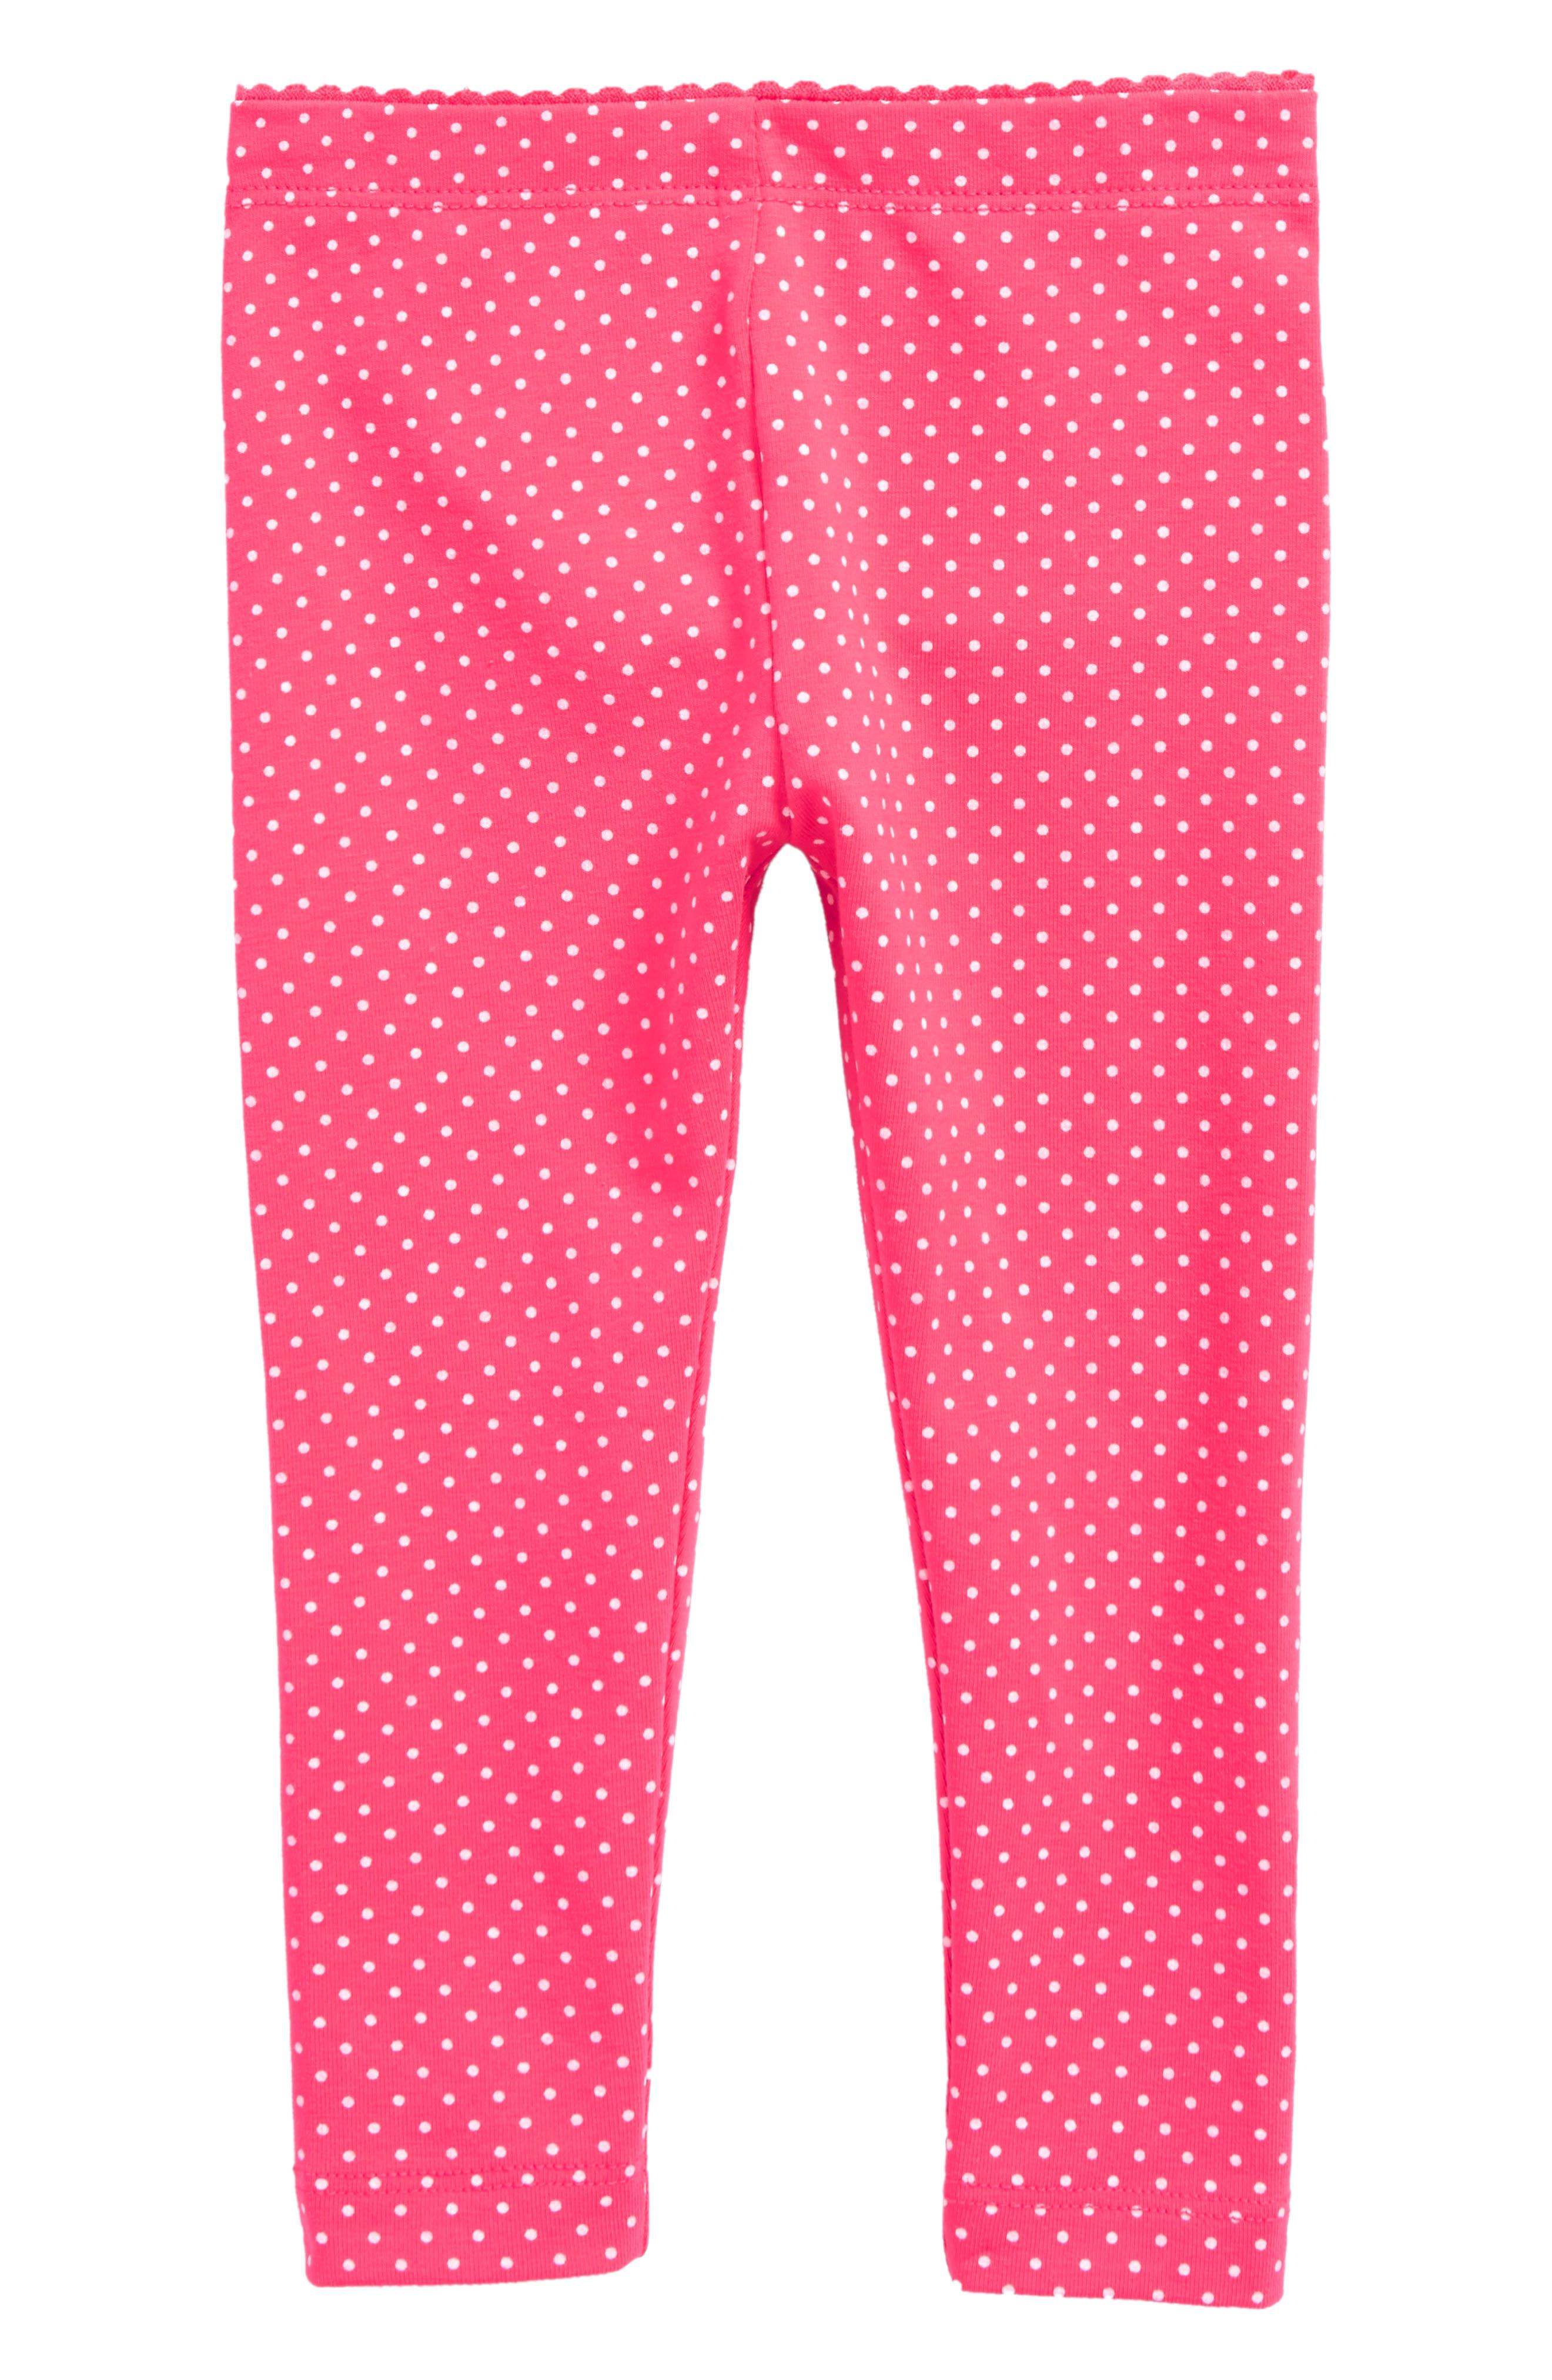 Pin Dot Leggings,                         Main,                         color, Candy Apple